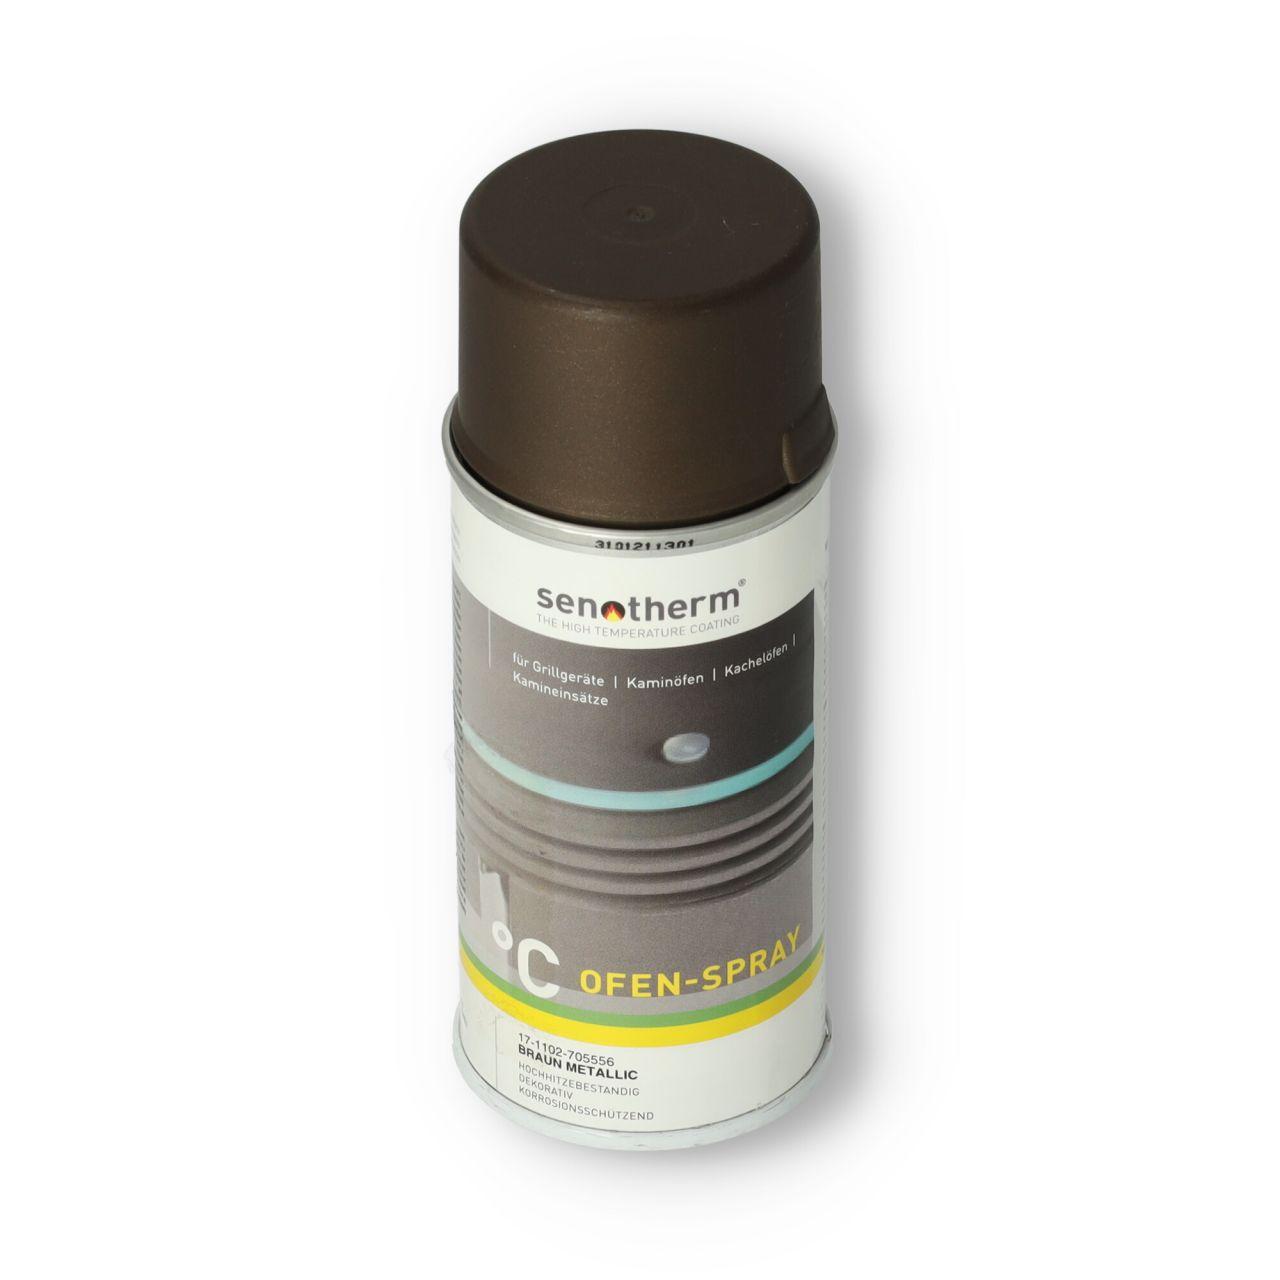 Ofenlack braun-metallic UHT   Senotherm   150 ml